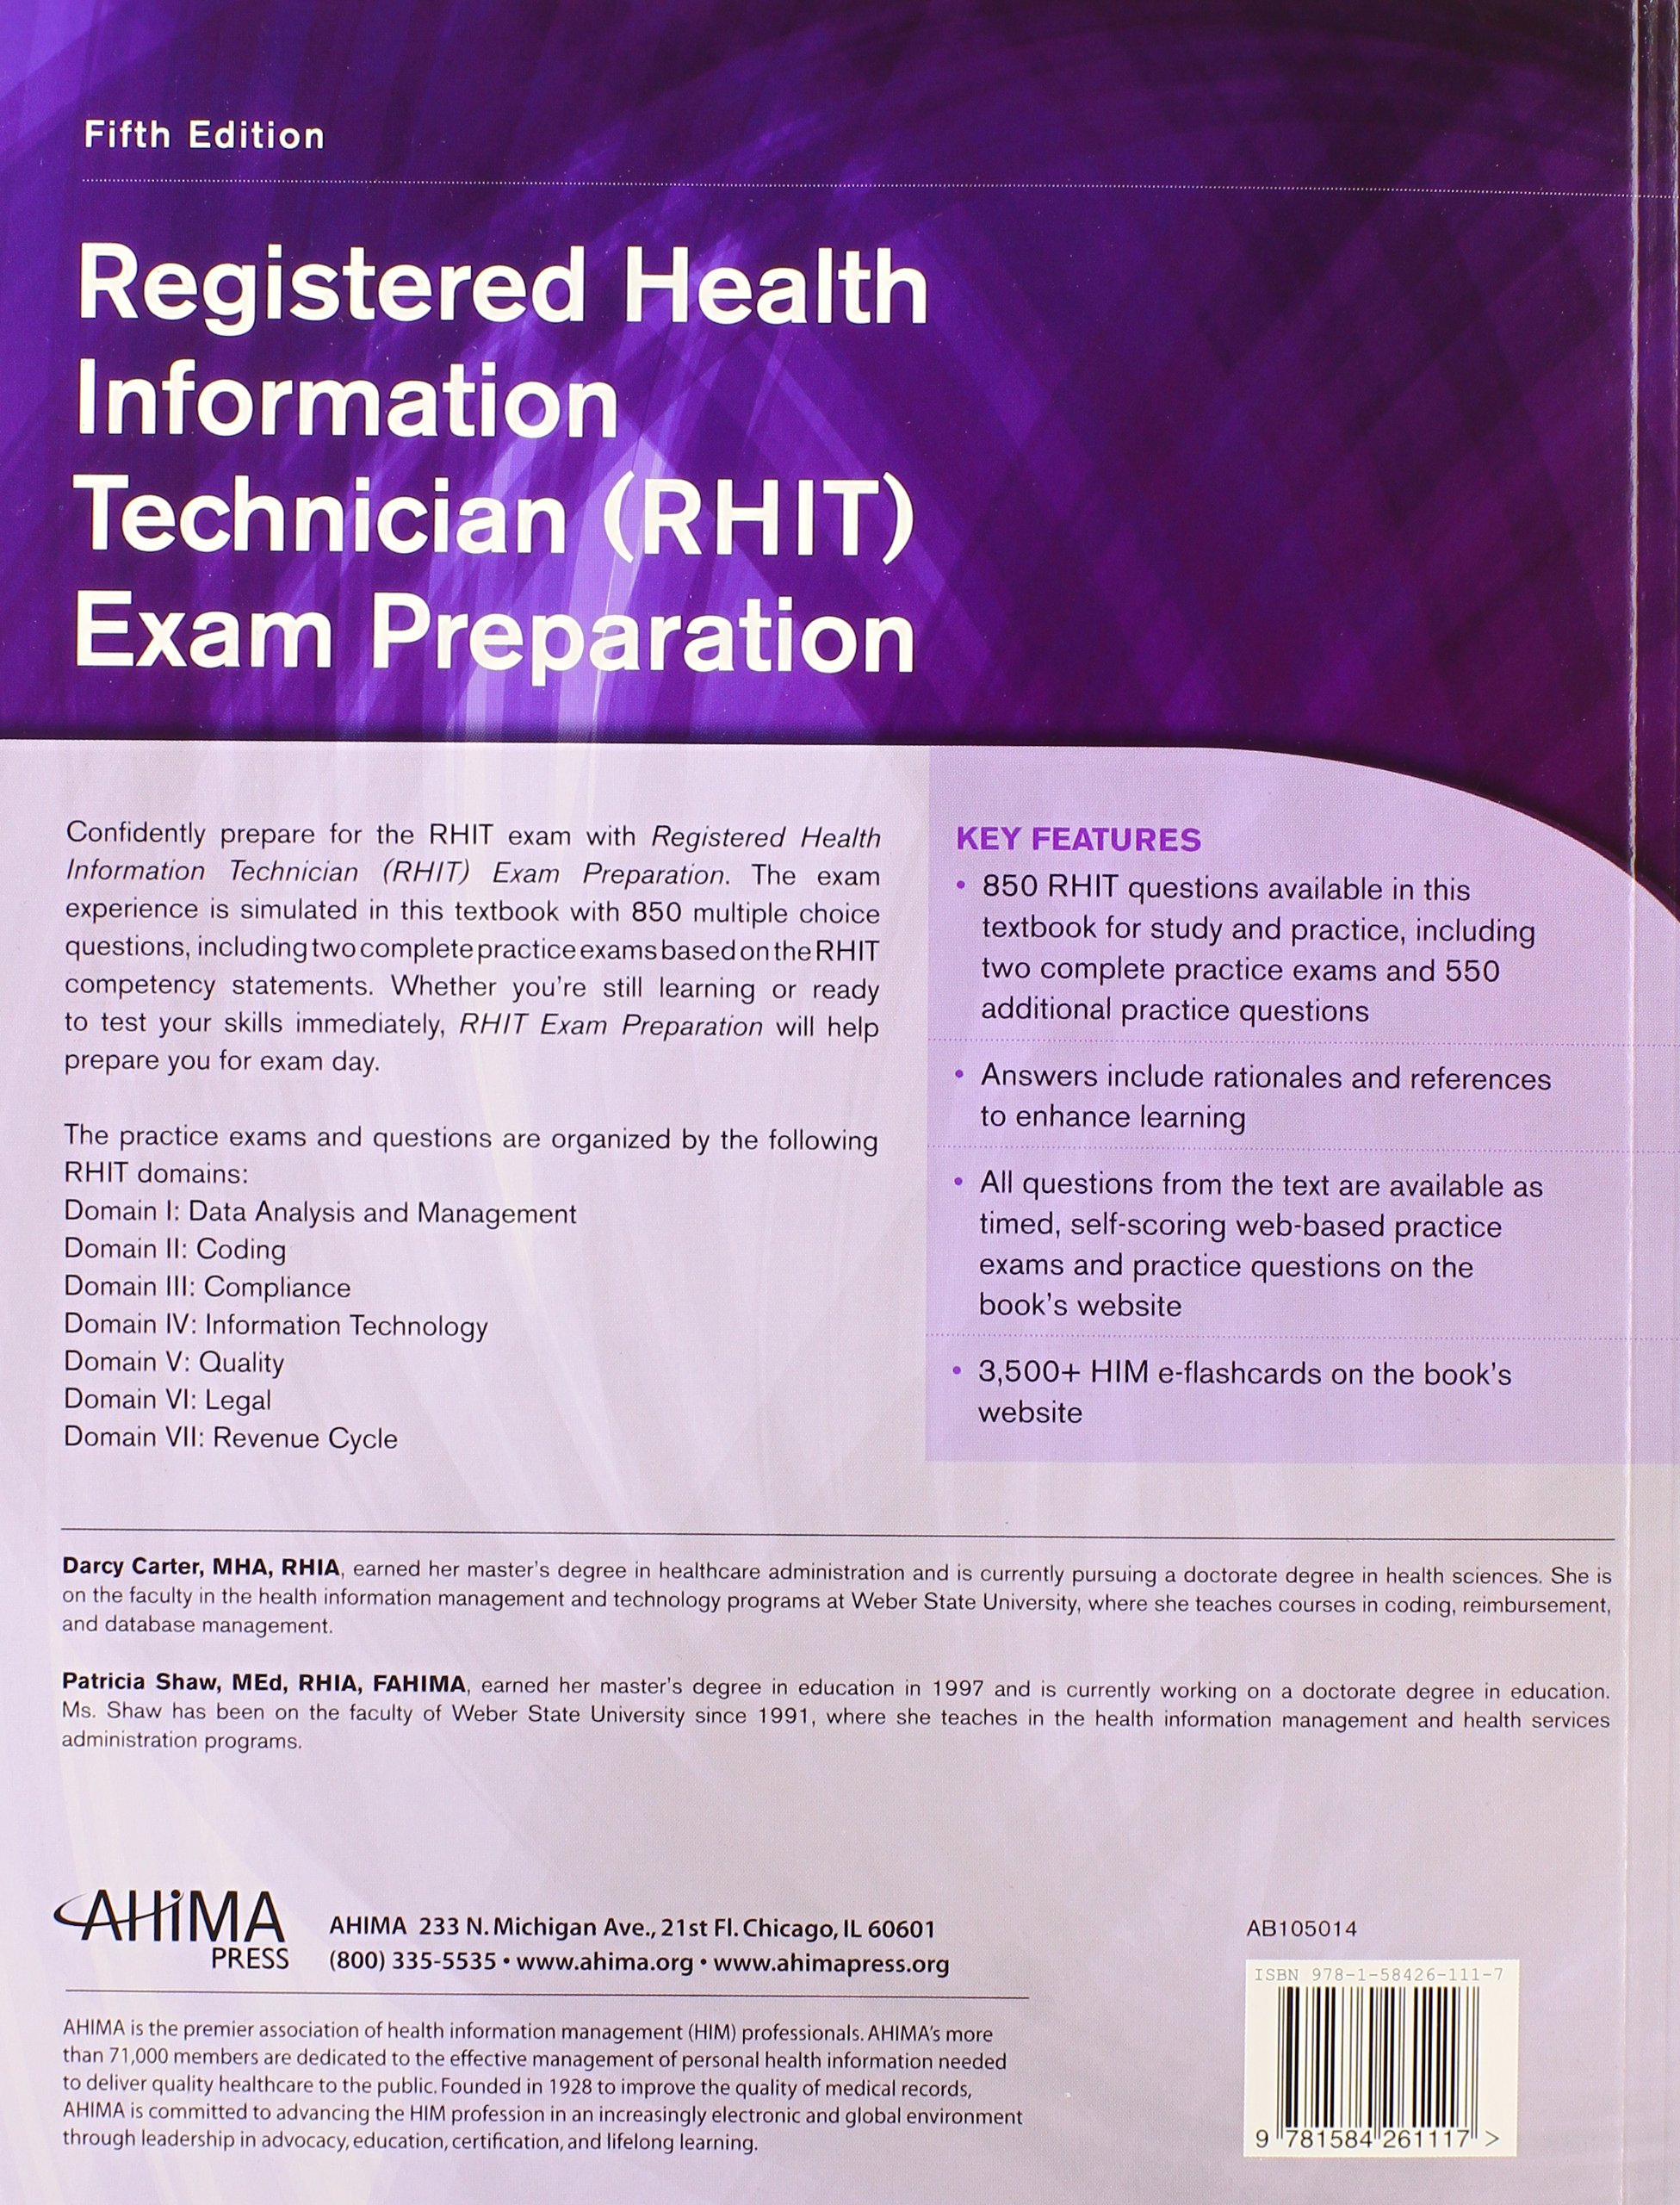 Buy Registered Health Information Technician Rhit Exam Preparation